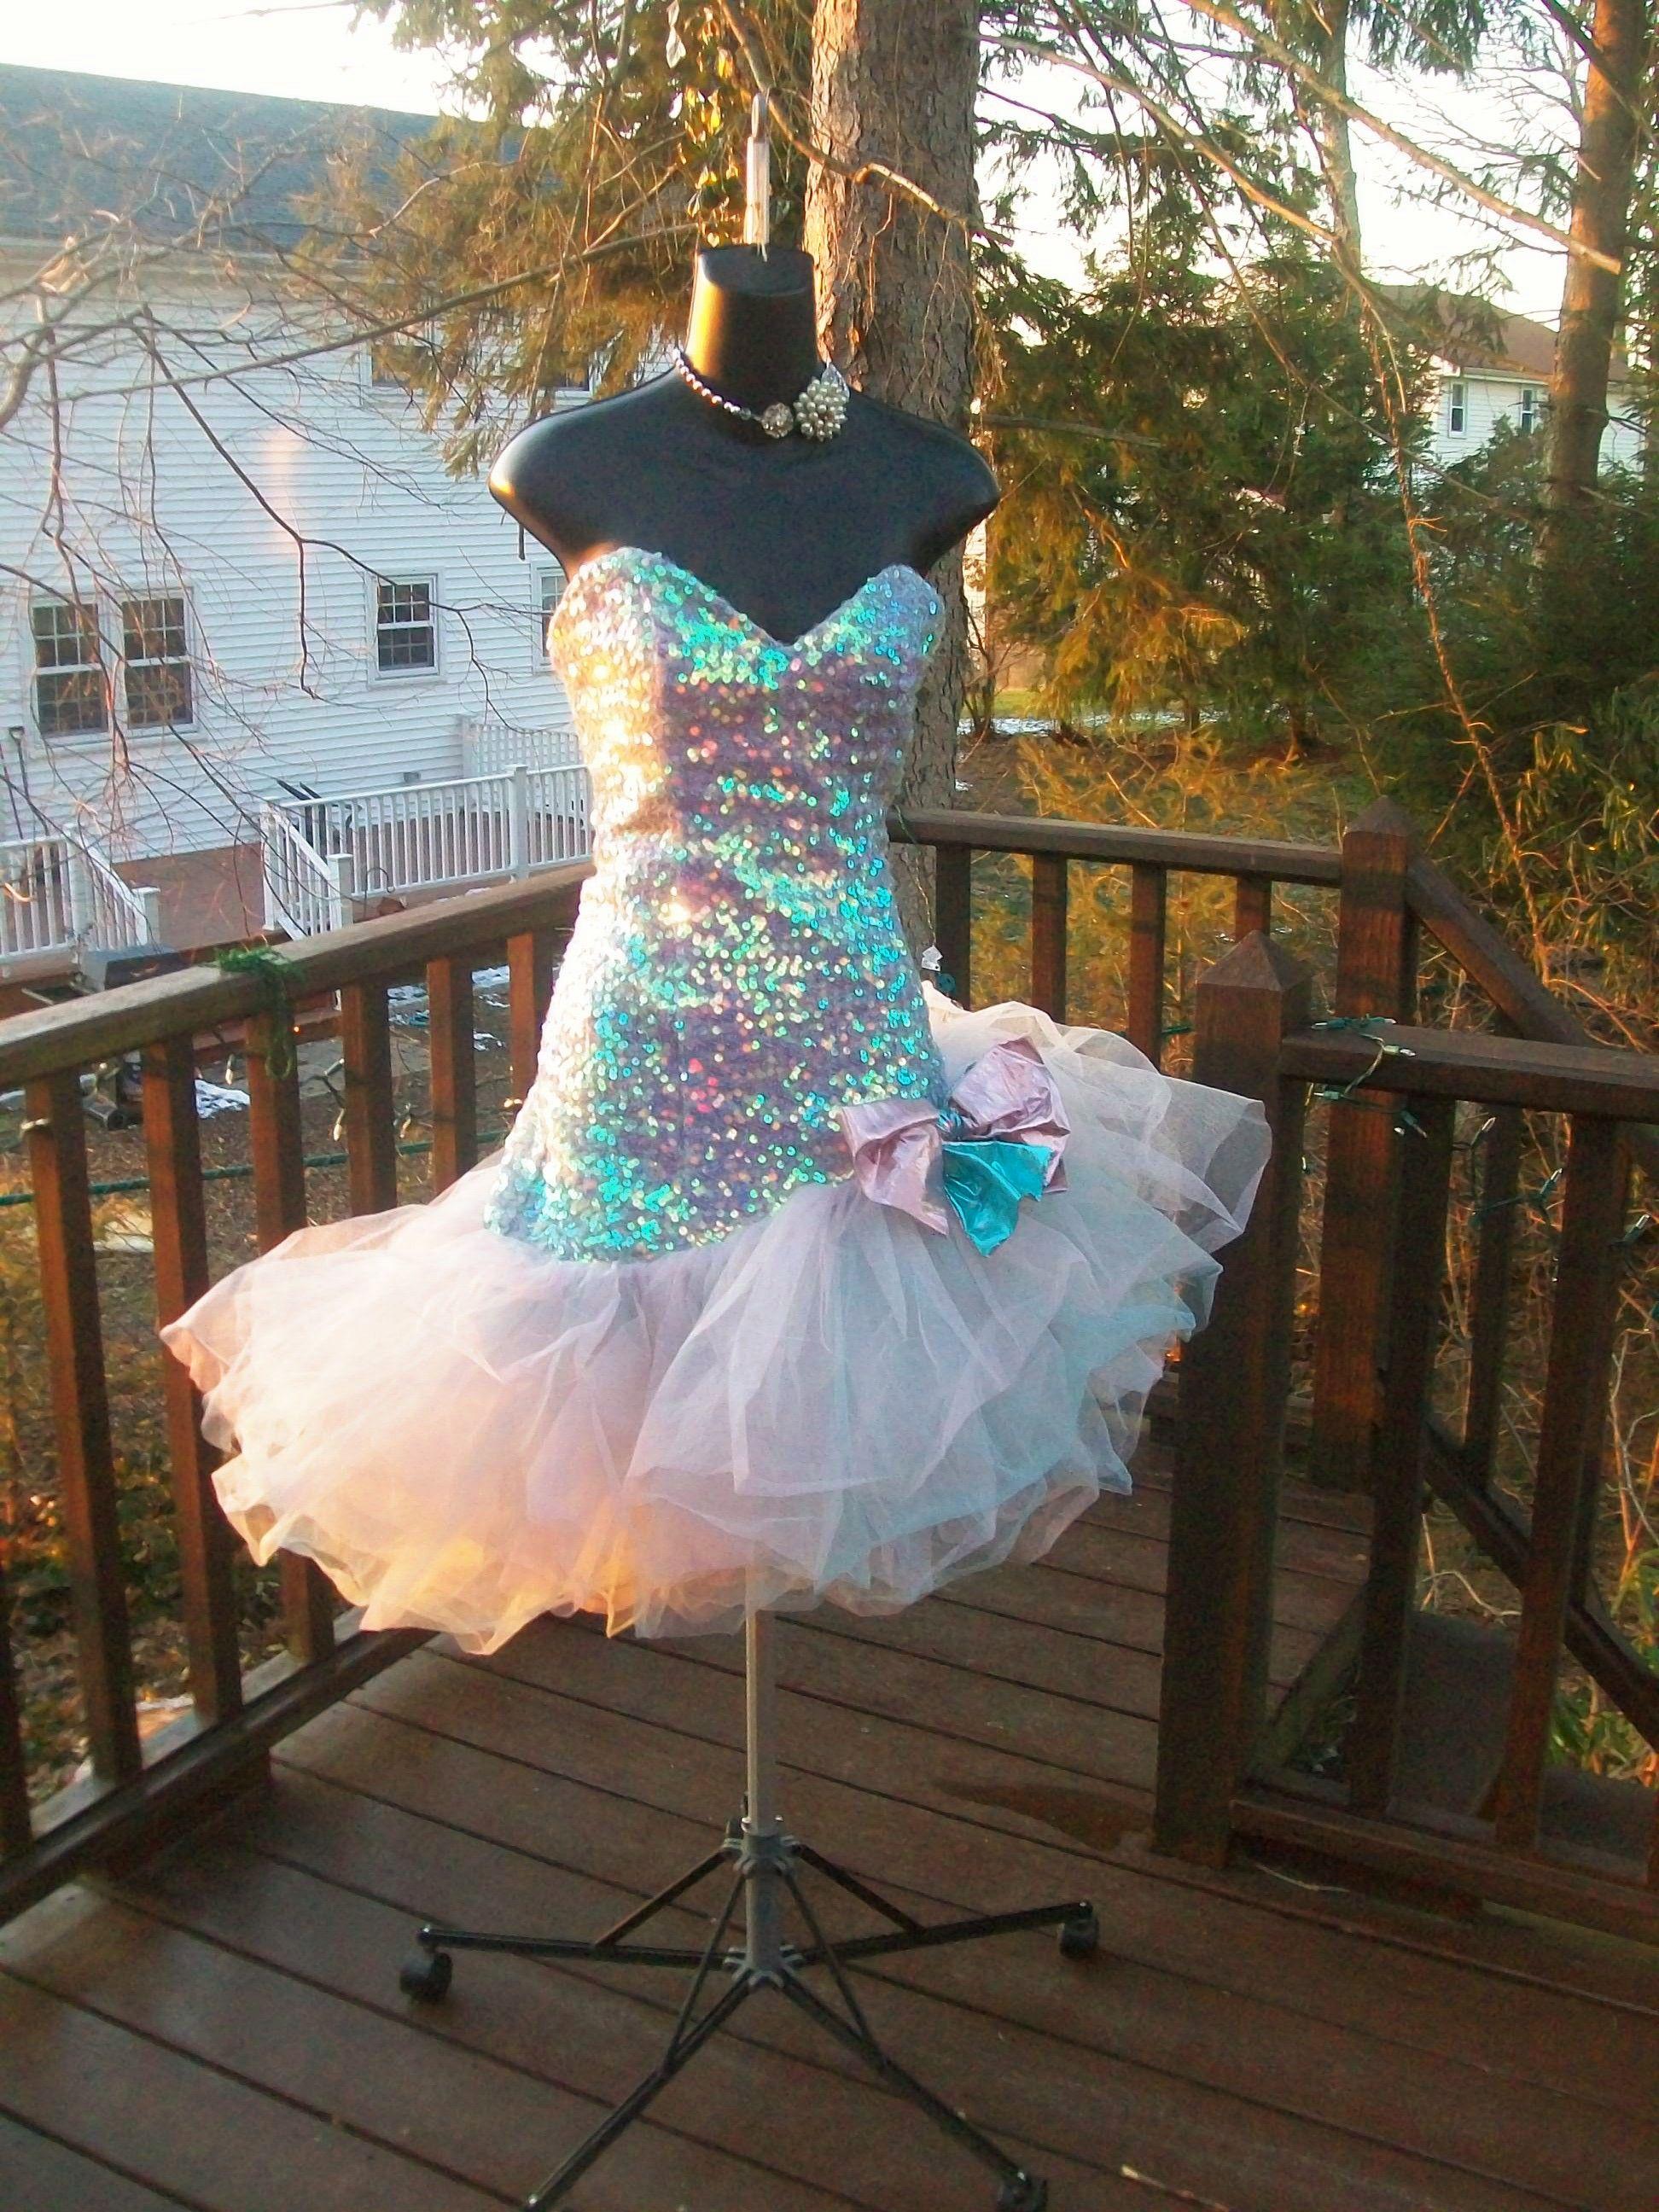 Pin by maria hårdberg on kläder pinterest s prom cgi and prom